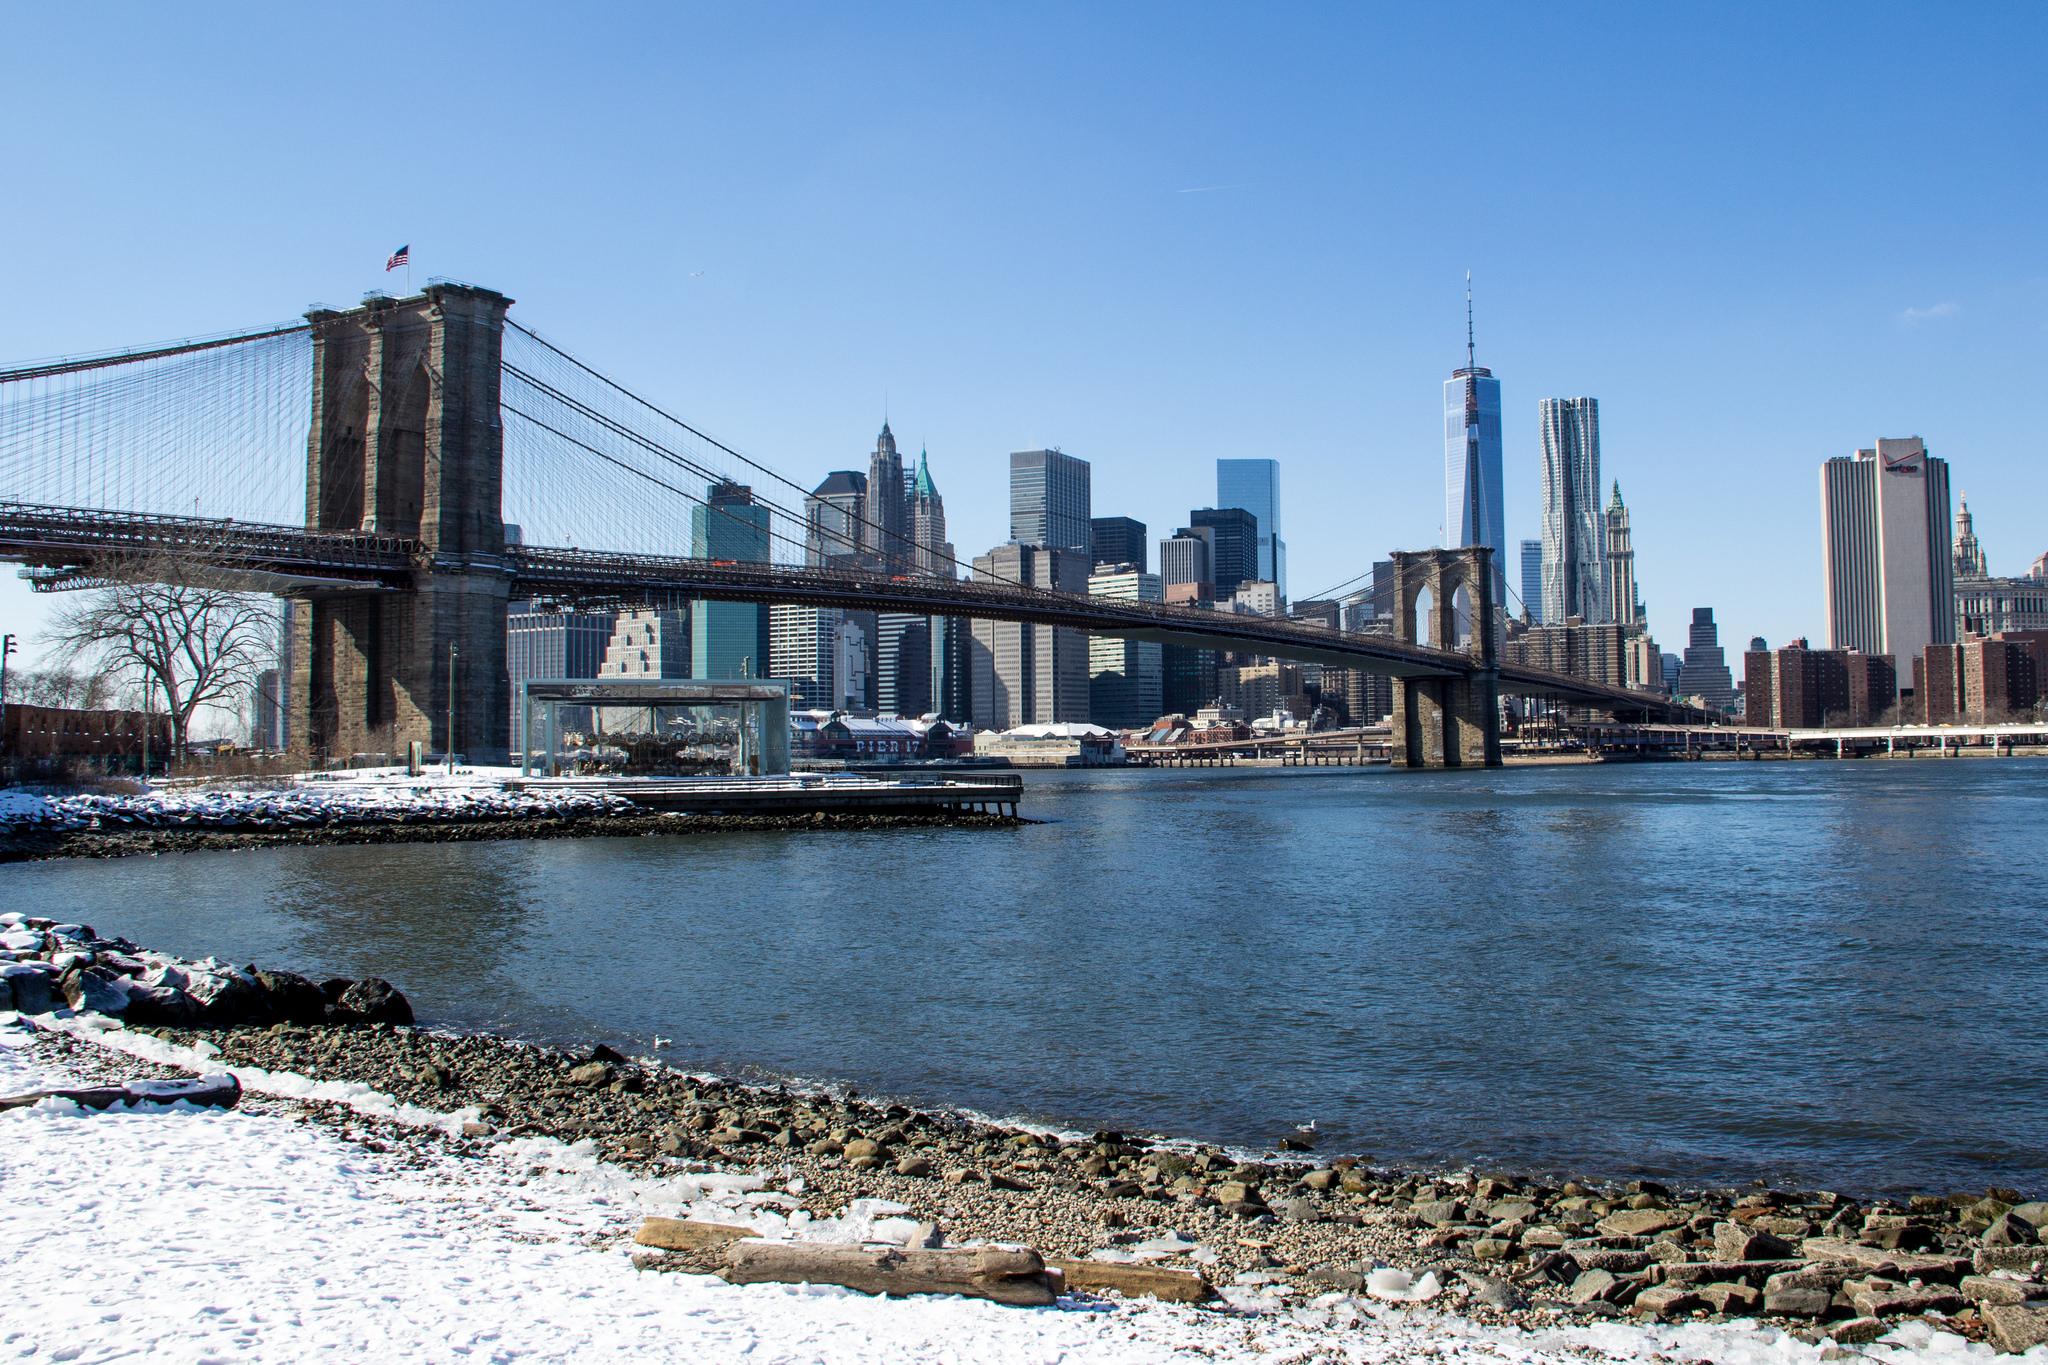 Das Wetter in New York im Februar